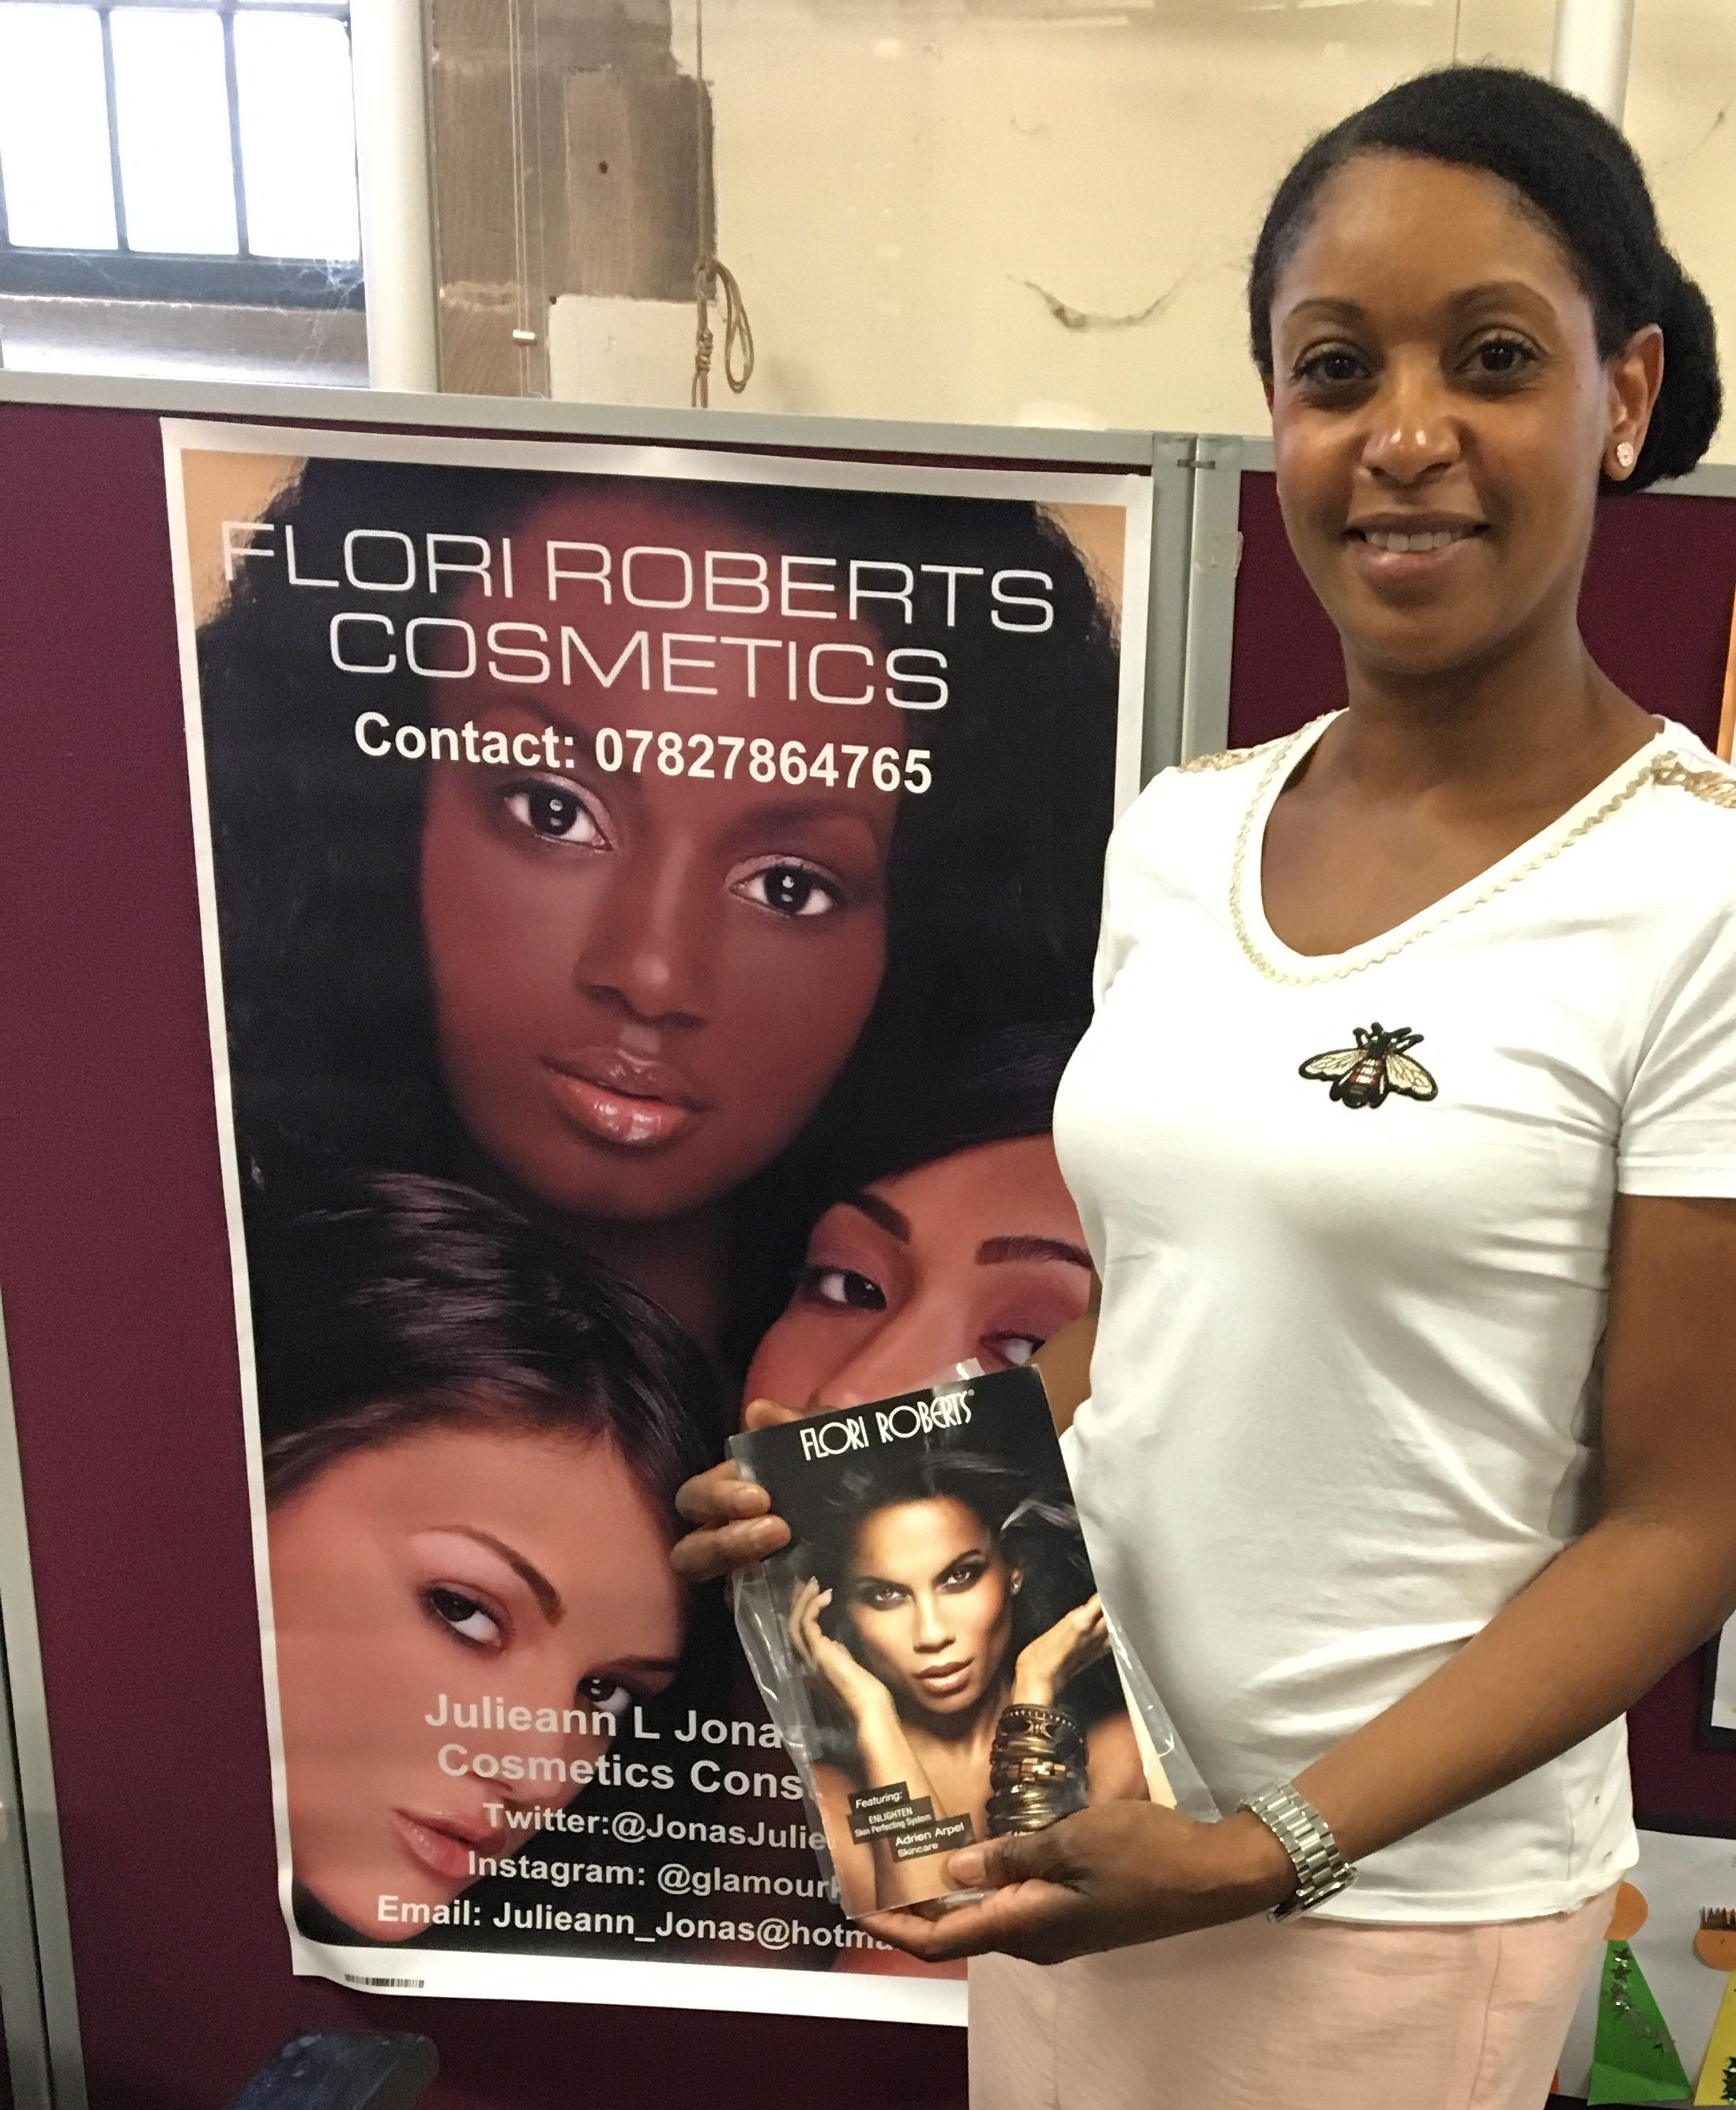 U.K. Flori Roberts Cosmetics (With images) It cosmetics